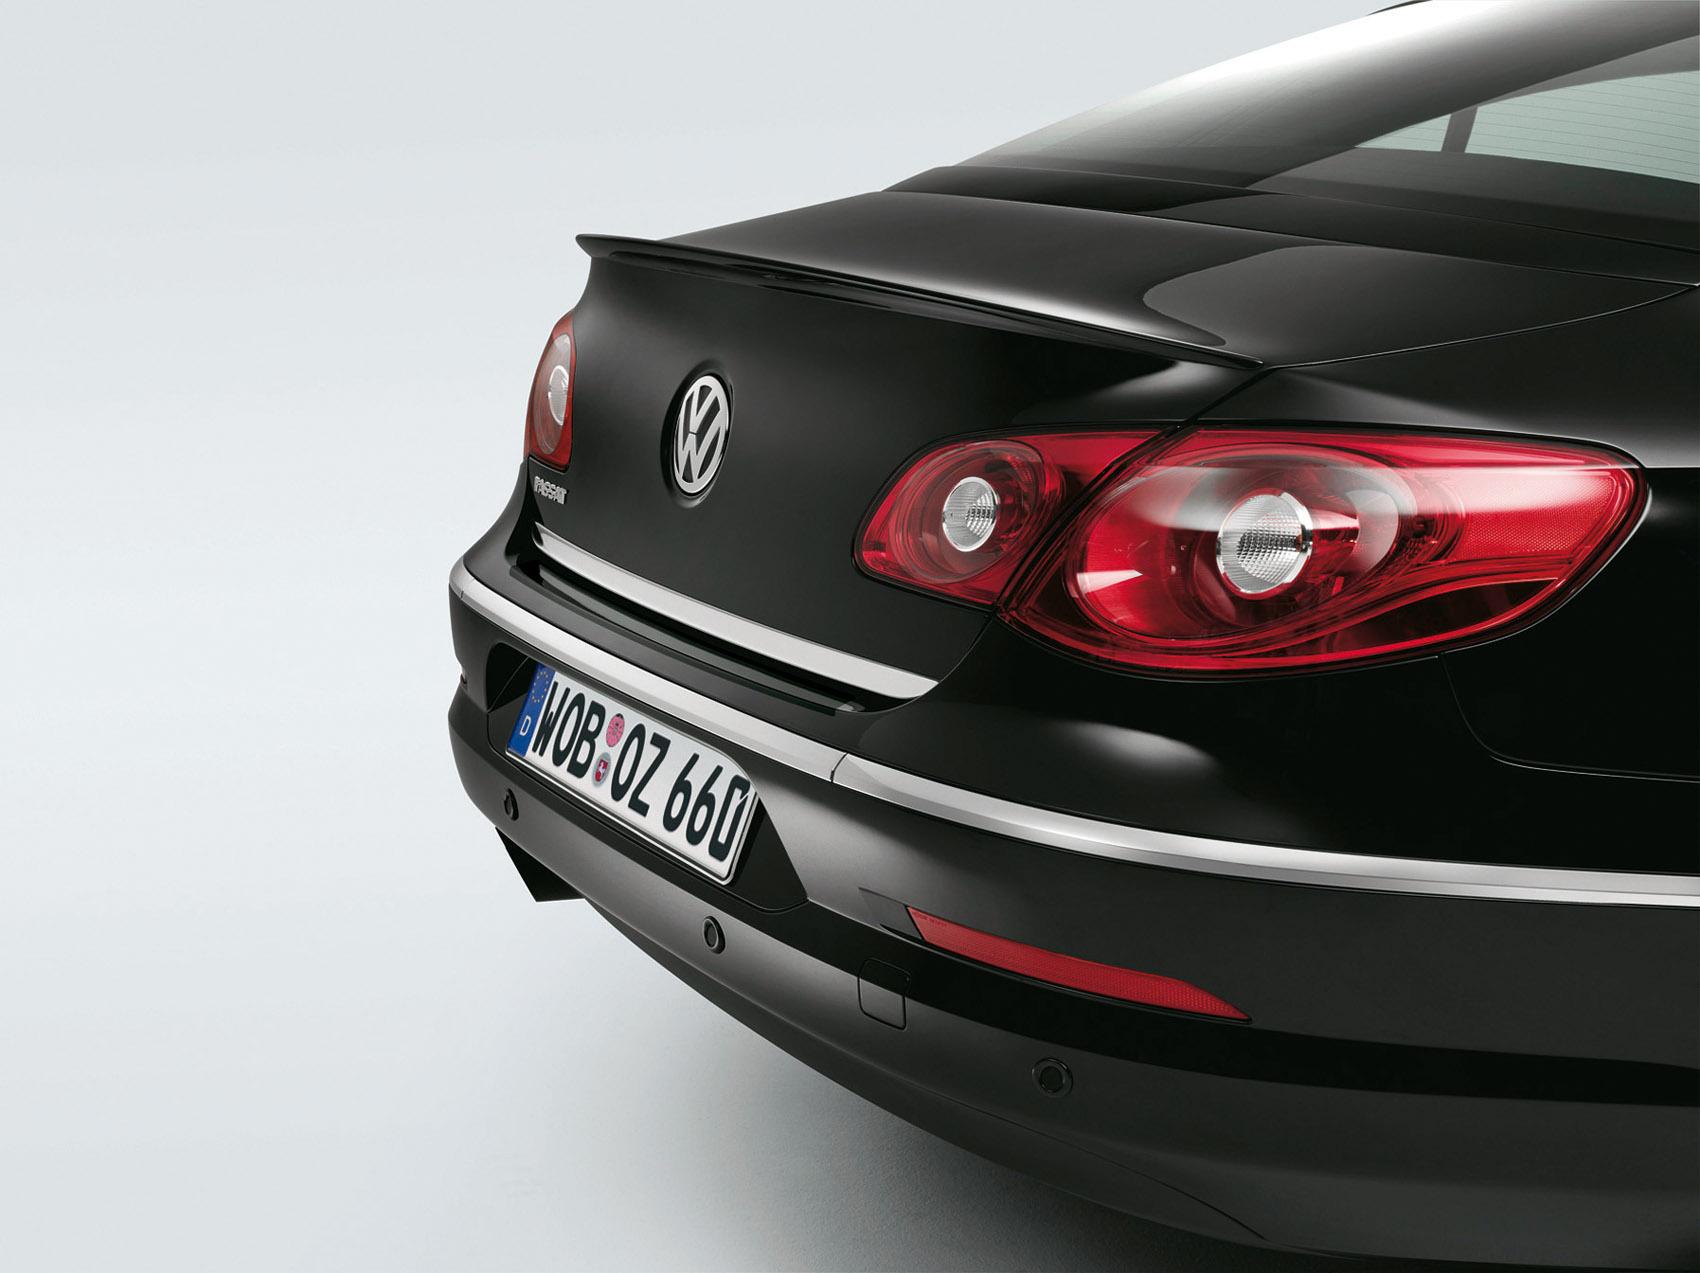 Passat CC Gets VW Genuine Accessories - autoevolution